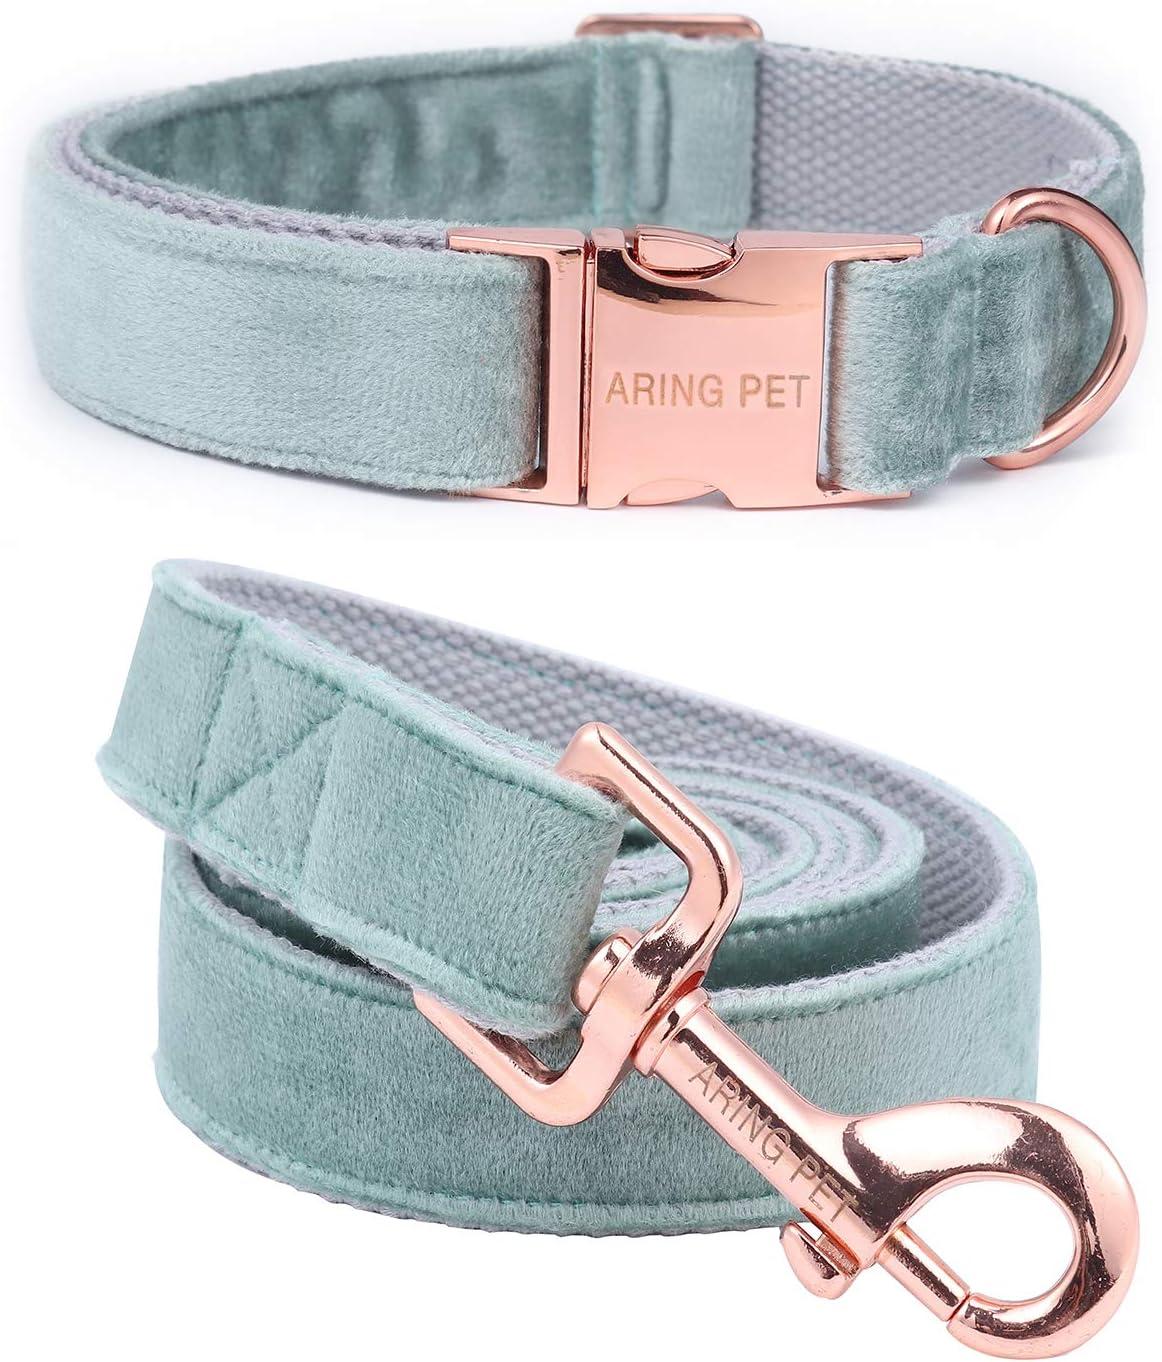 ARING Large-scale sale PET Dog Collar Arlington Mall Velvet Leash Set and